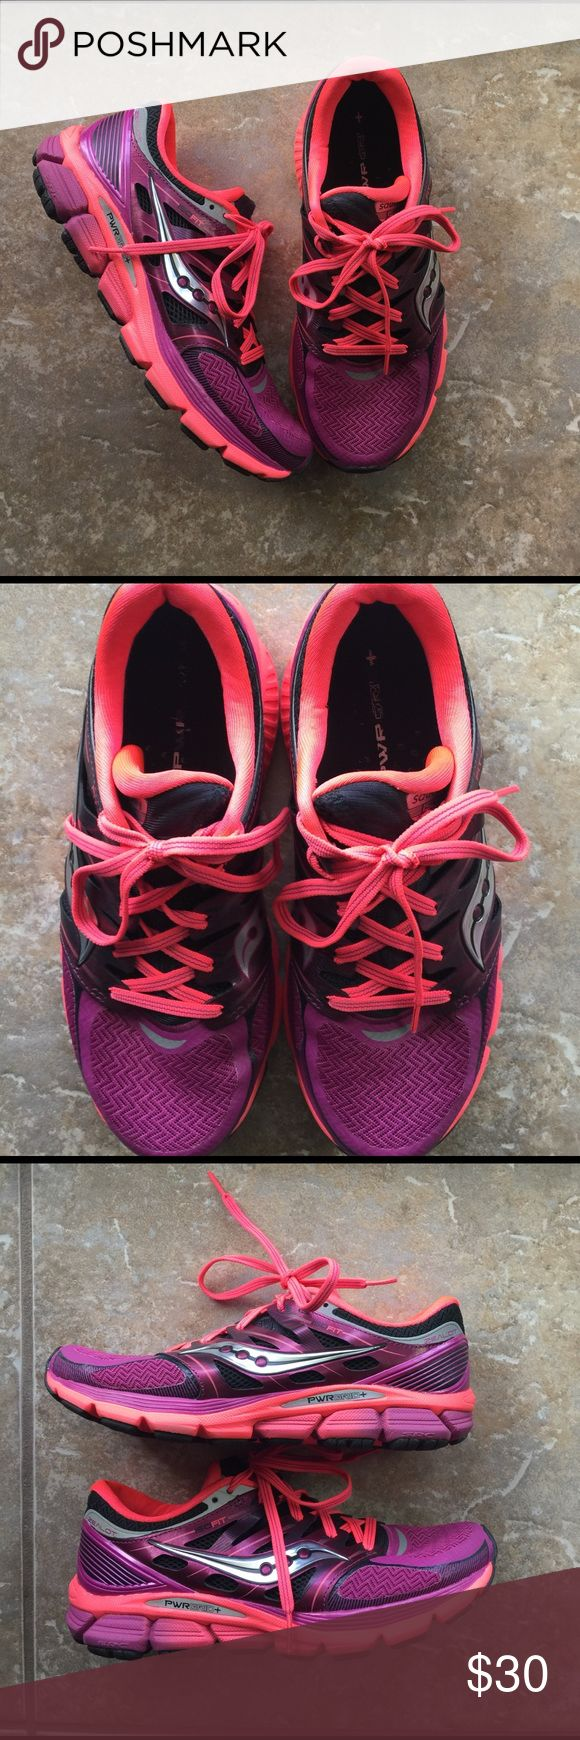 Saucony Zealot ISO Running Shoe Saucony Women's Zealot ISO Running Shoe; True to Size; Lightly worn. Saucony Shoes Athletic Shoes